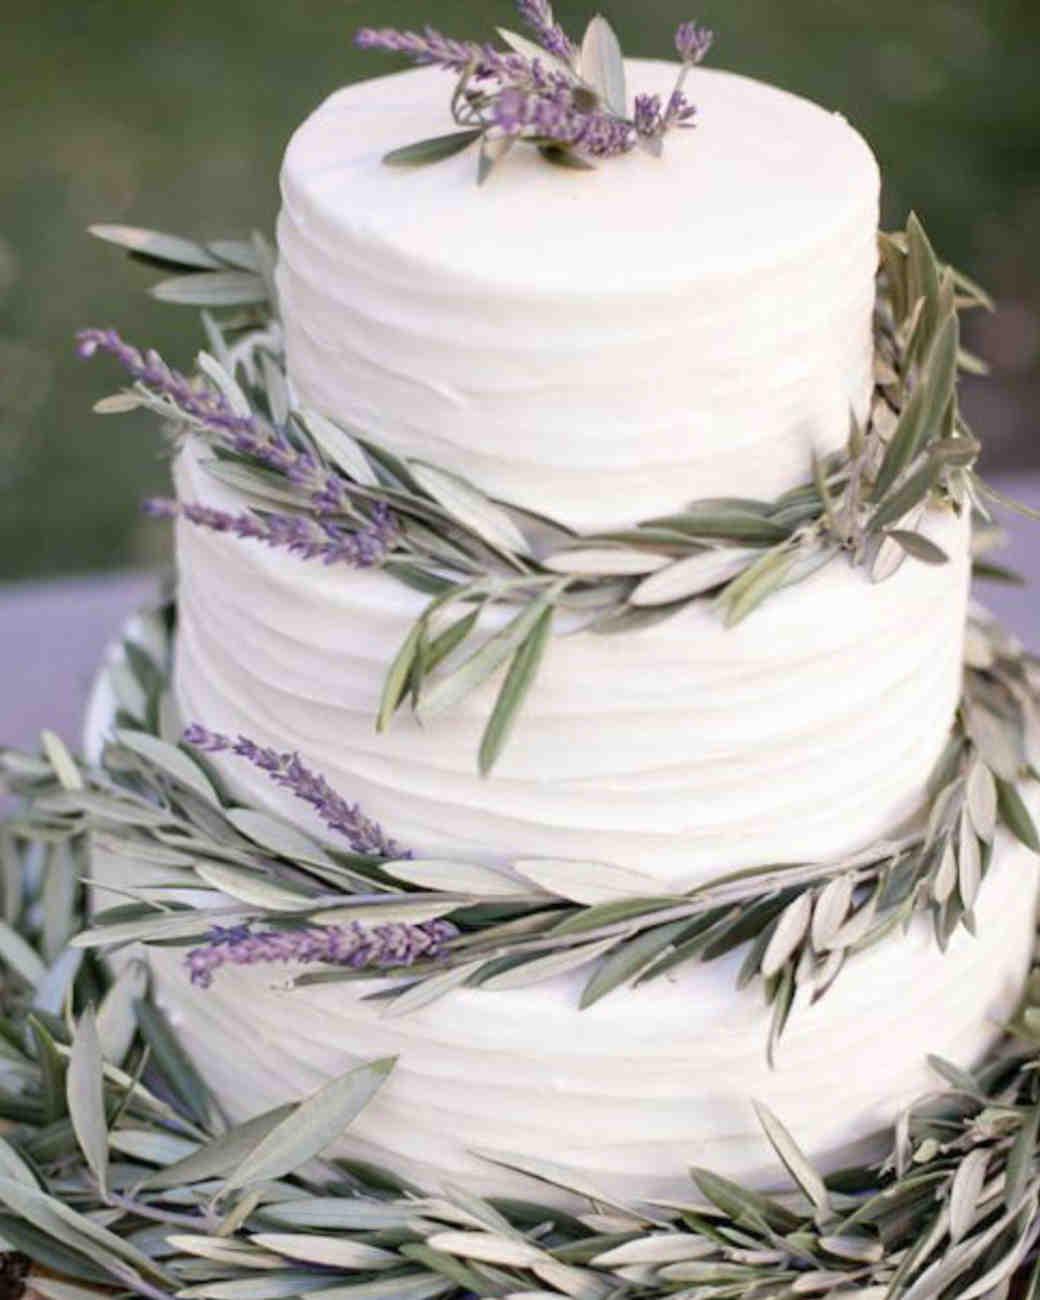 Vegan wedding cake recipe best